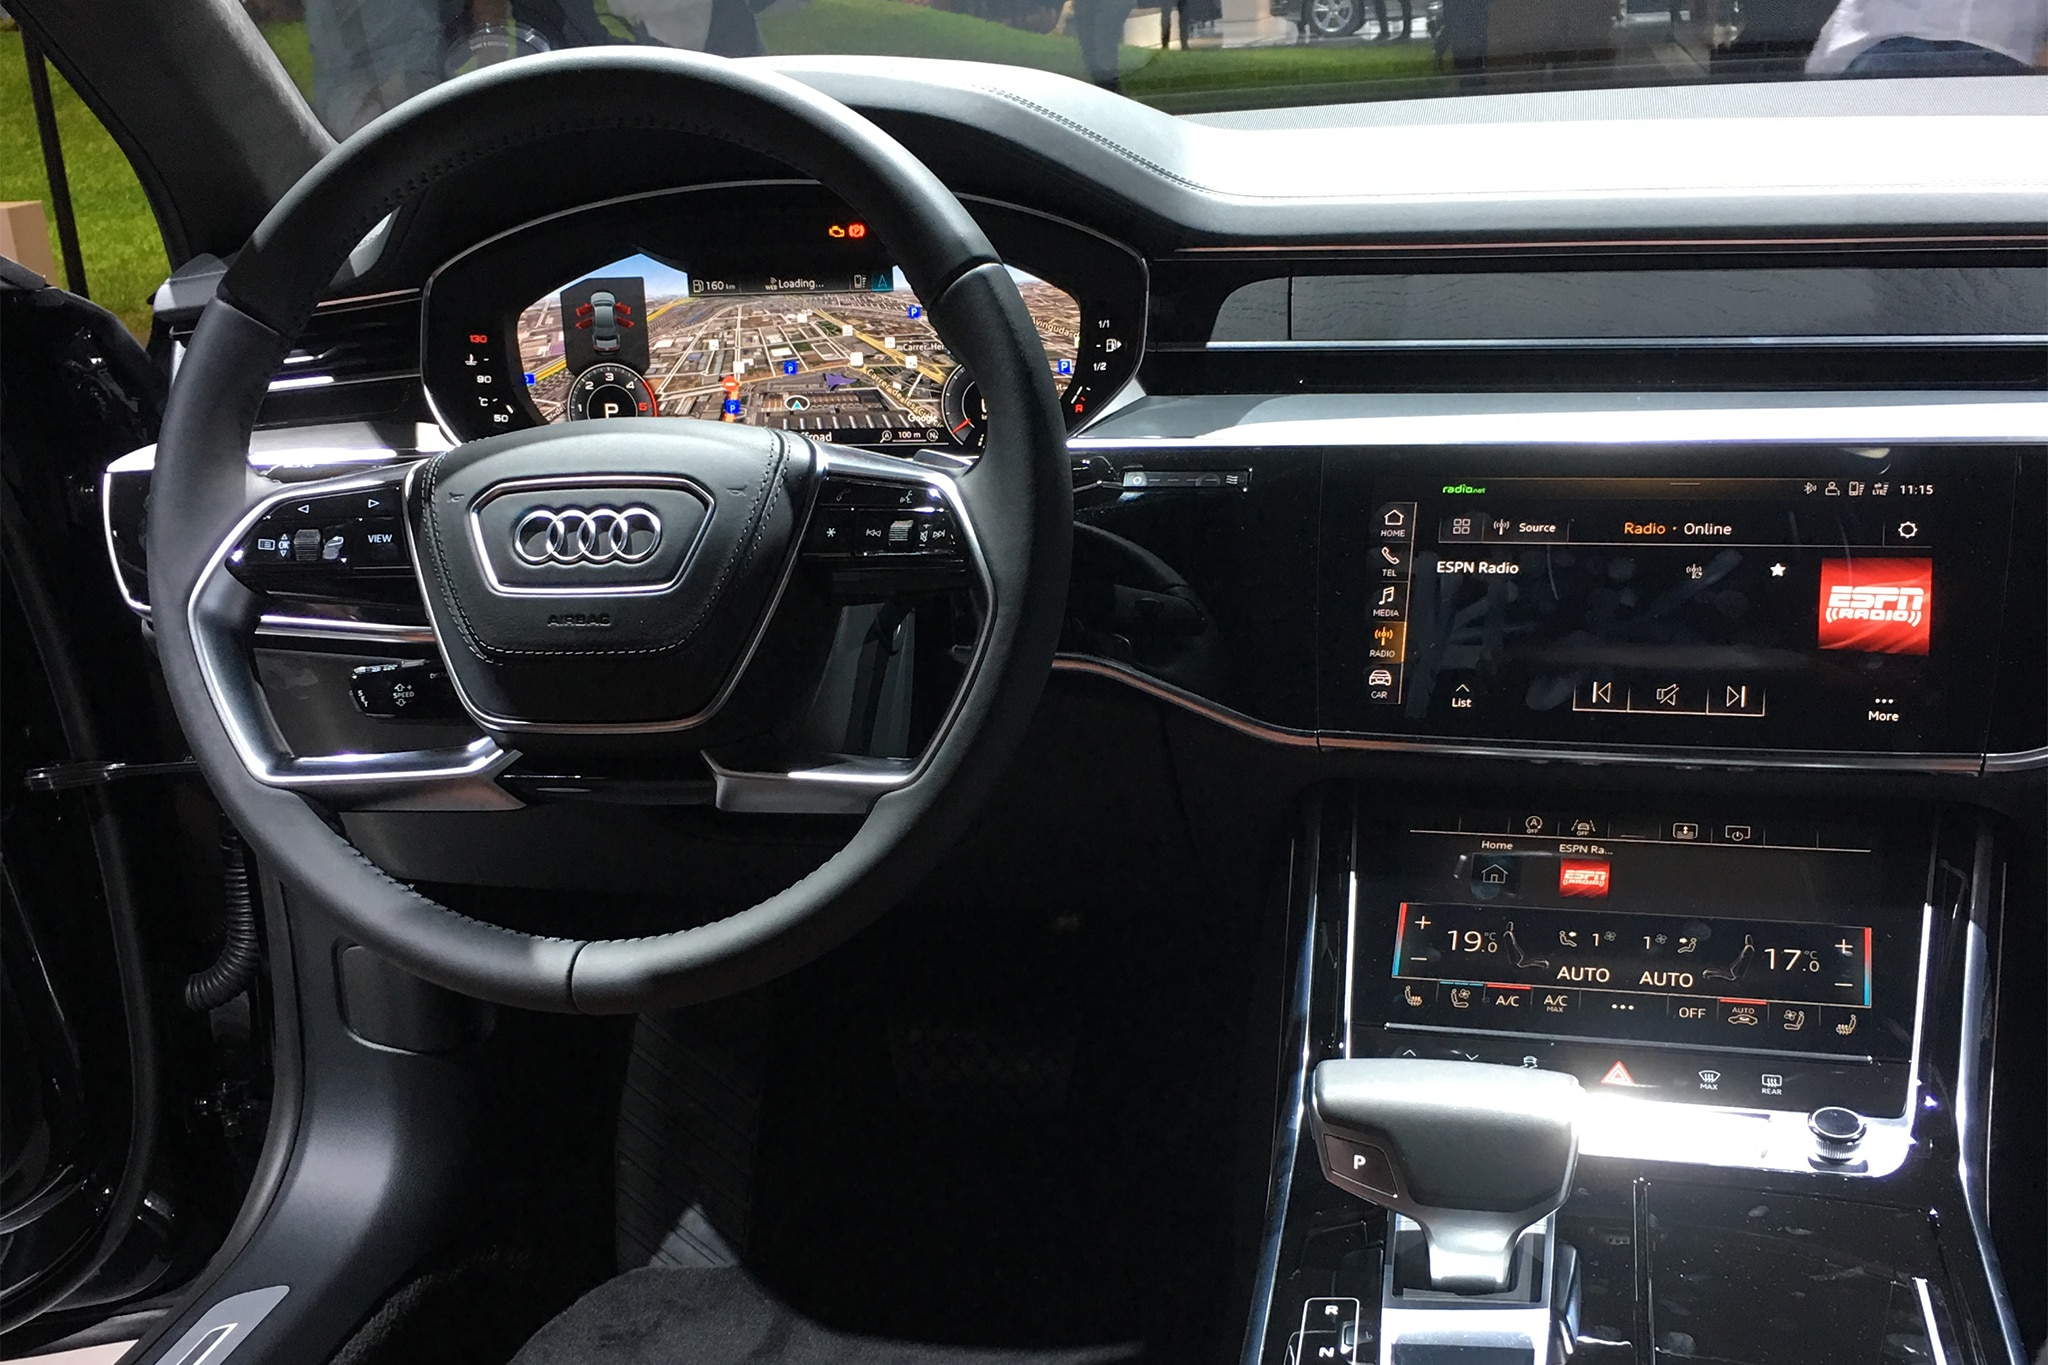 Seven Key Areas About the 2019 Audi A8 We Explored at the Audi ... on audi cars, audi s7, audi a5, audi rs8, audi q7, audi custom, audi r5, audi r8, audi a10, audi interior, audi jeep, audi a7, audi s6, audi qs5, audi s8, audi fox, audi supercar, audi models, audi a3,